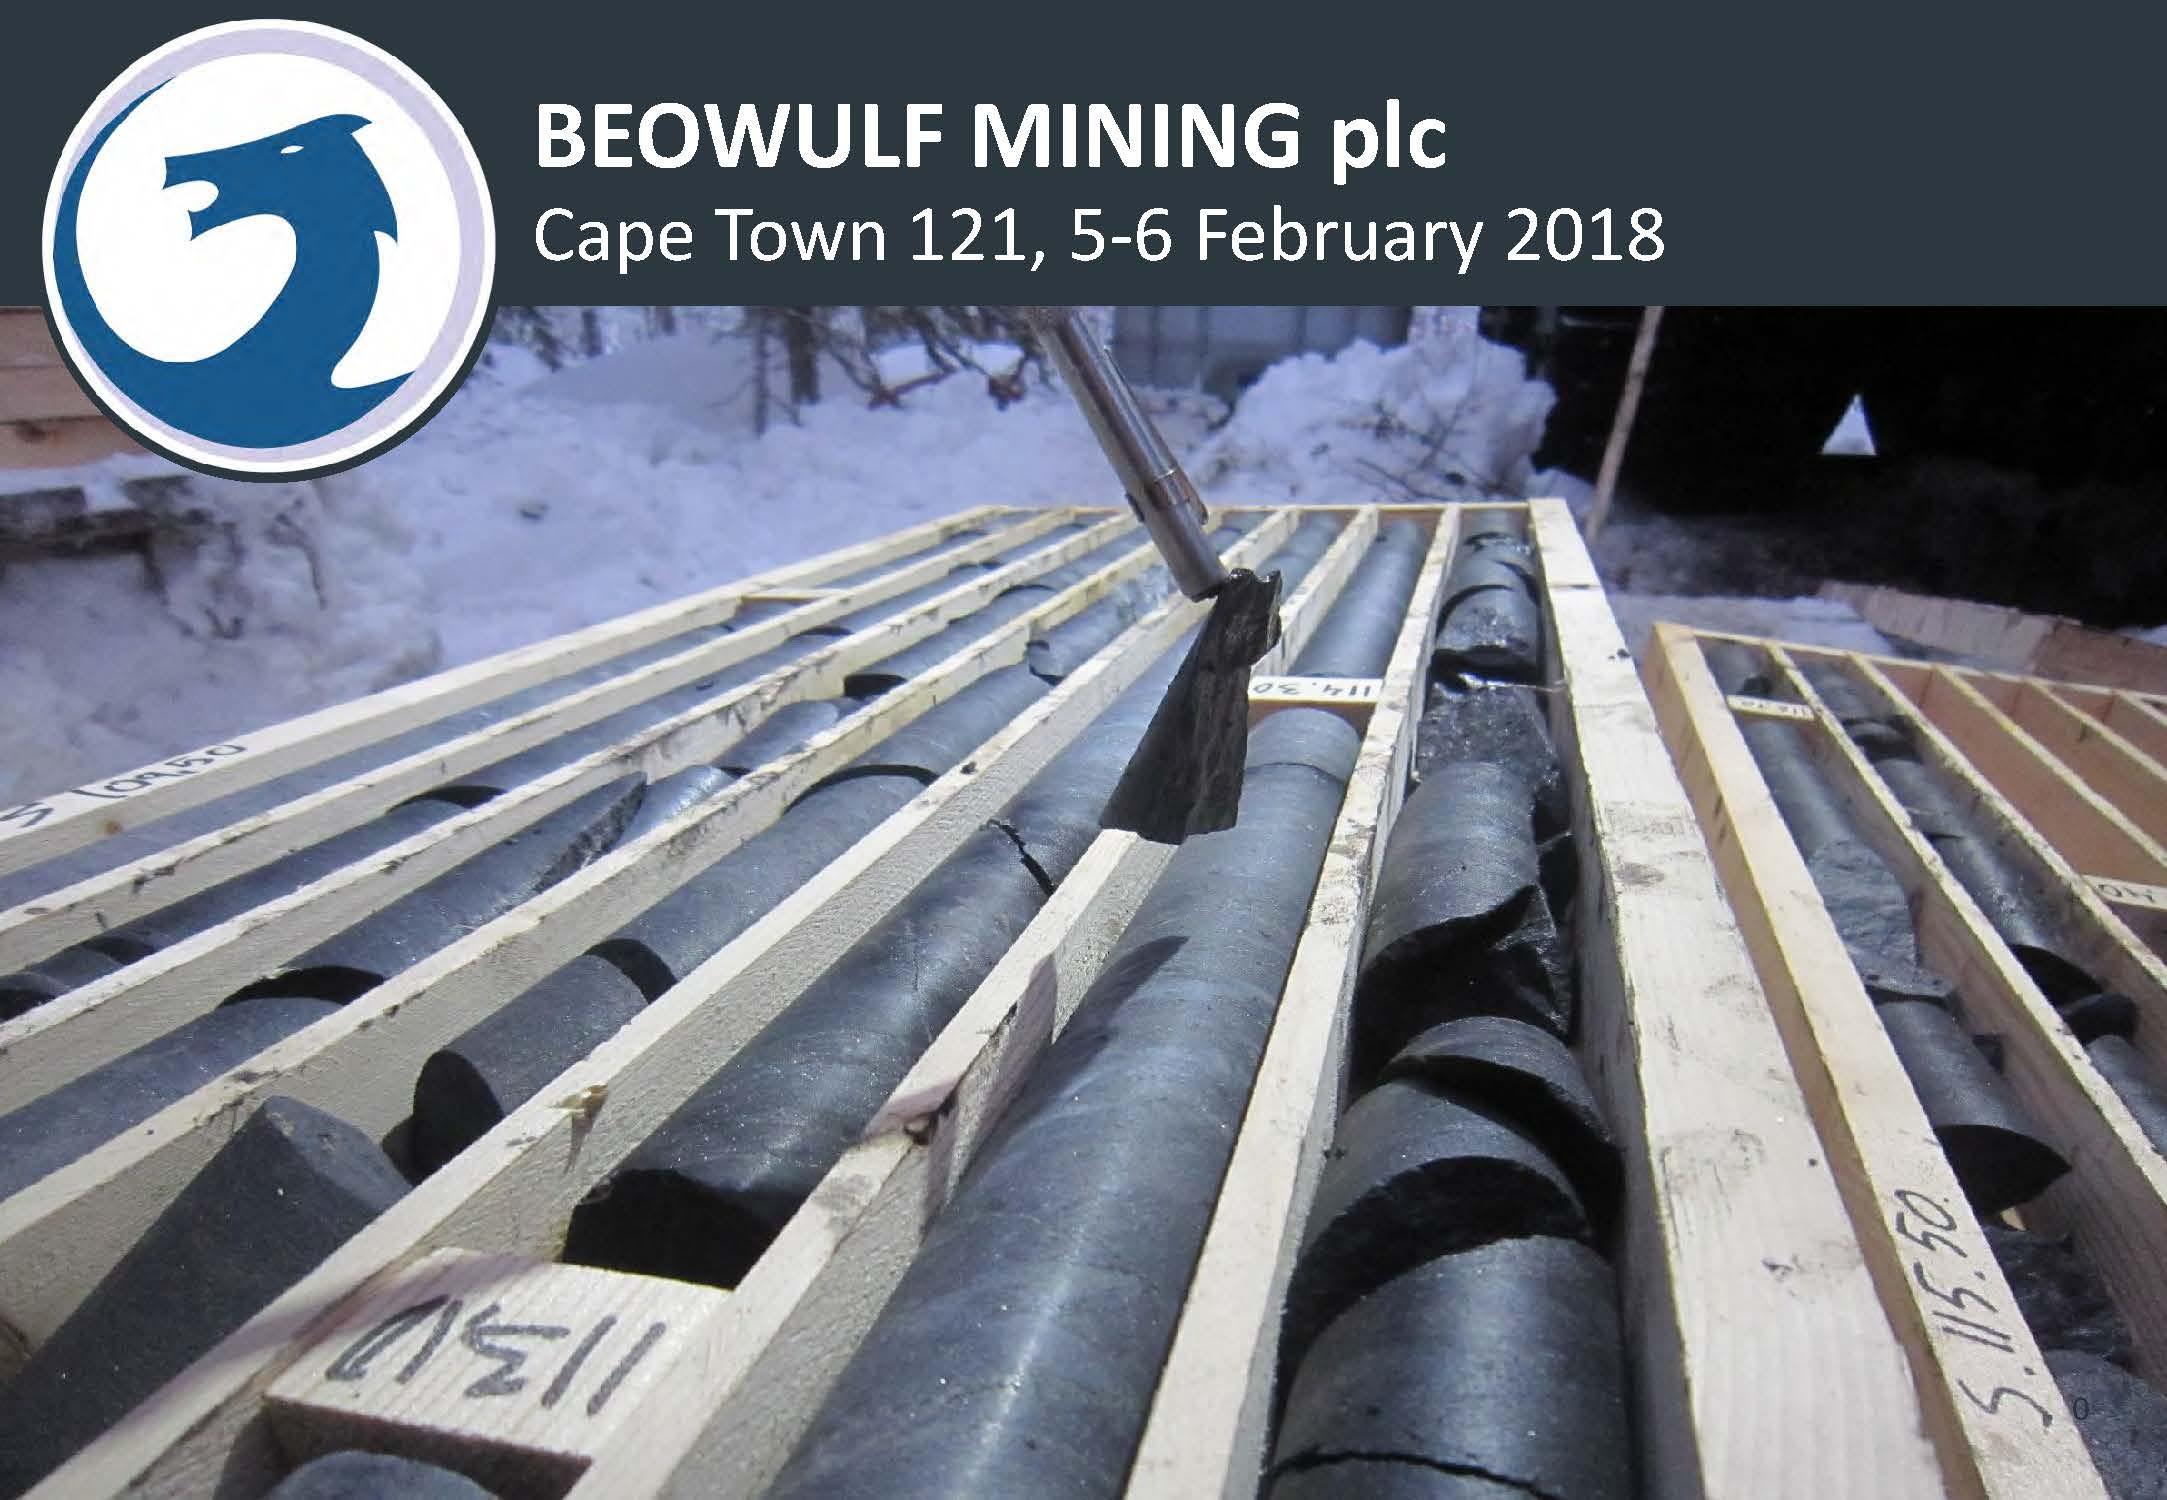 Beowulf Mining plc Corporate Presentation Feb 2018